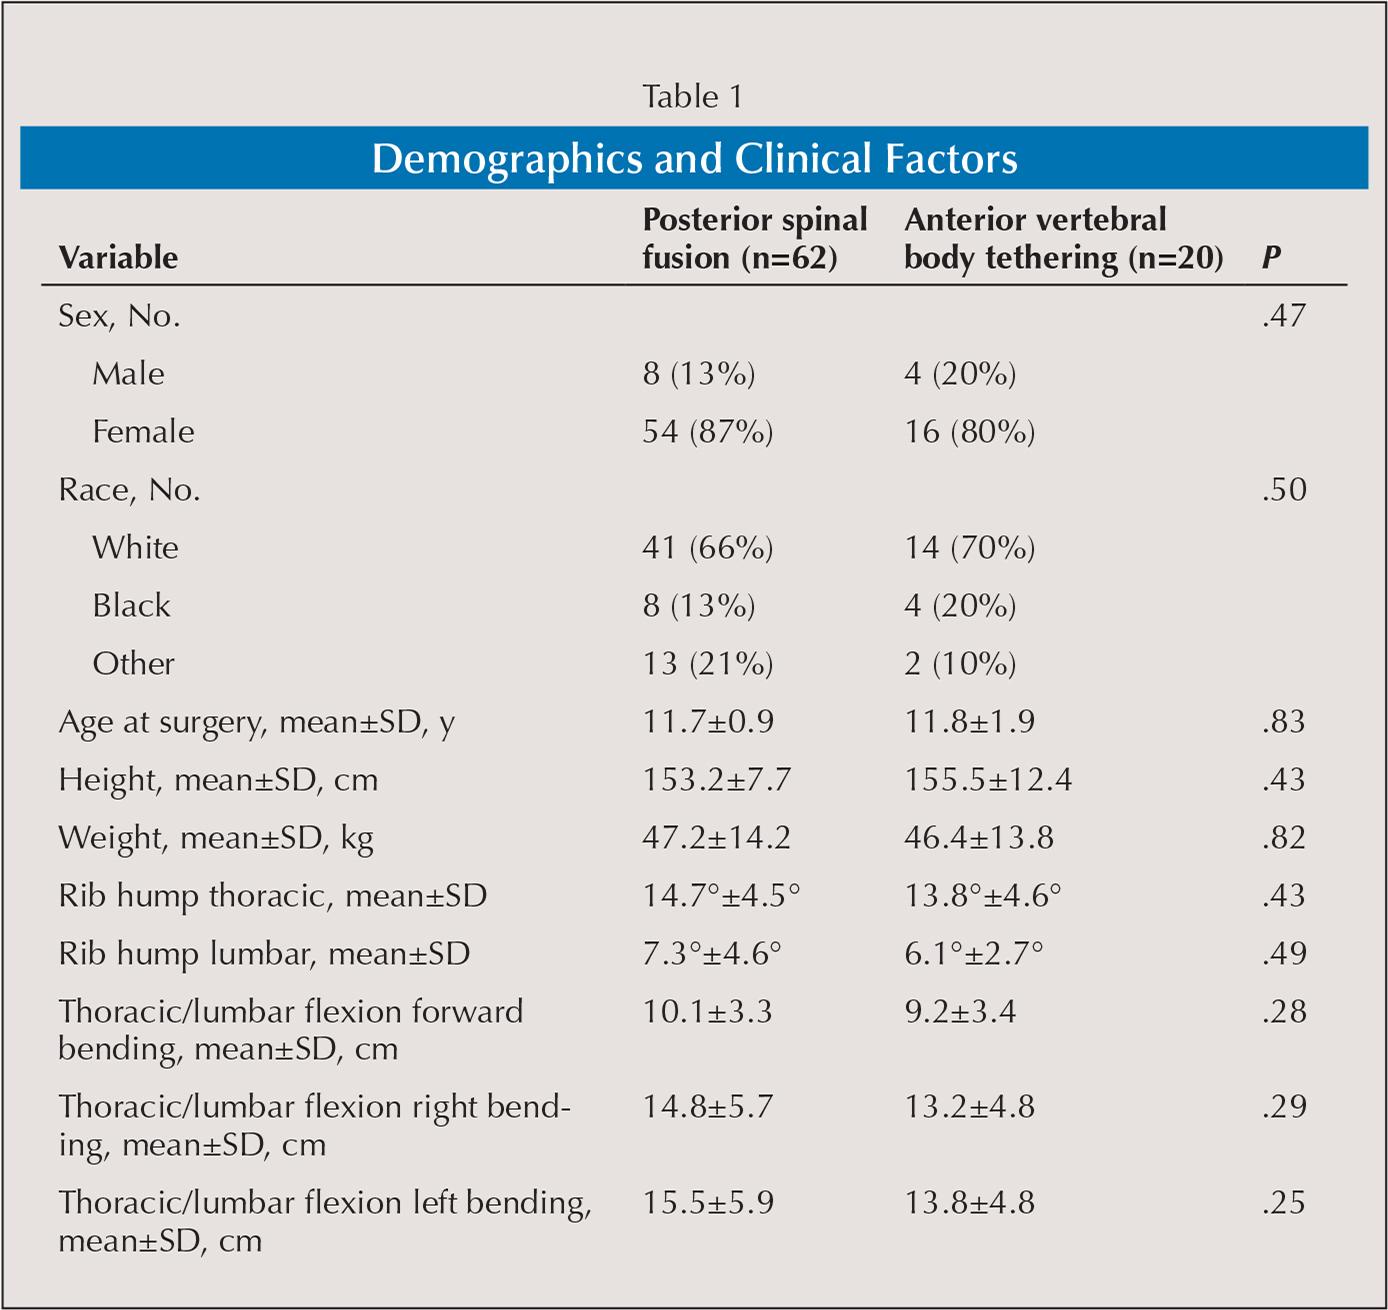 Demographics and Clinical Factors